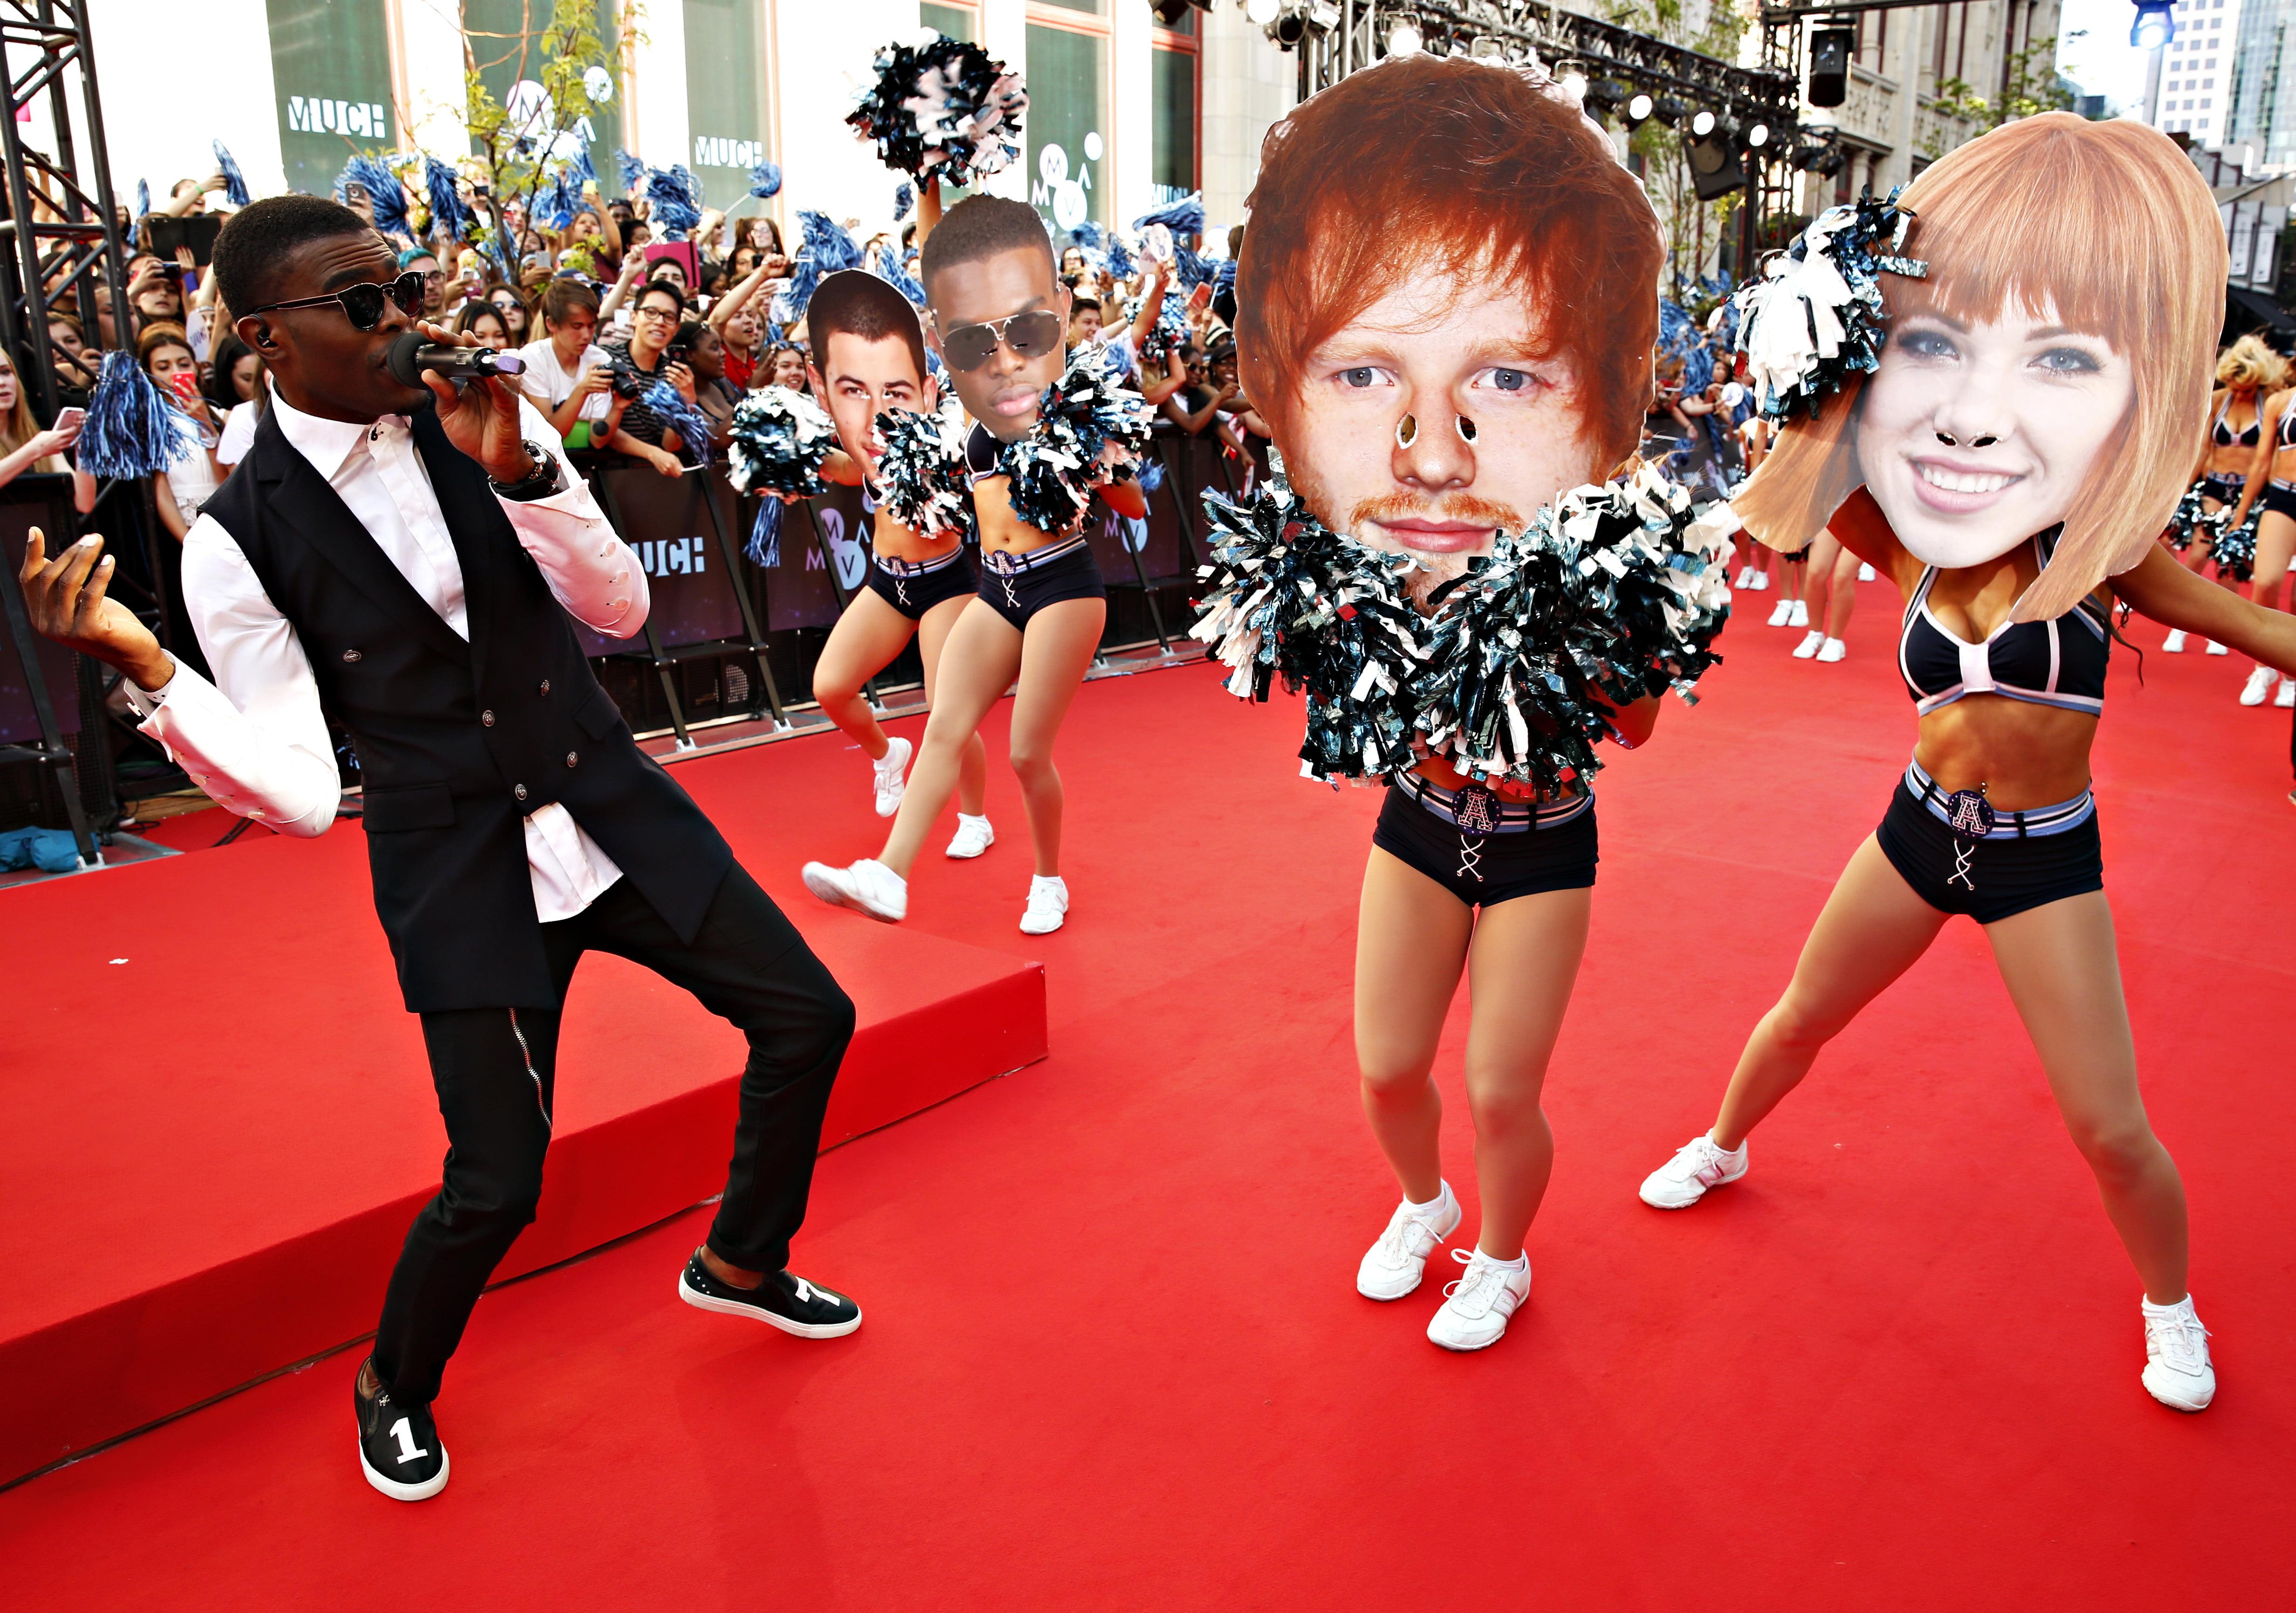 Omi and his cheerleaders